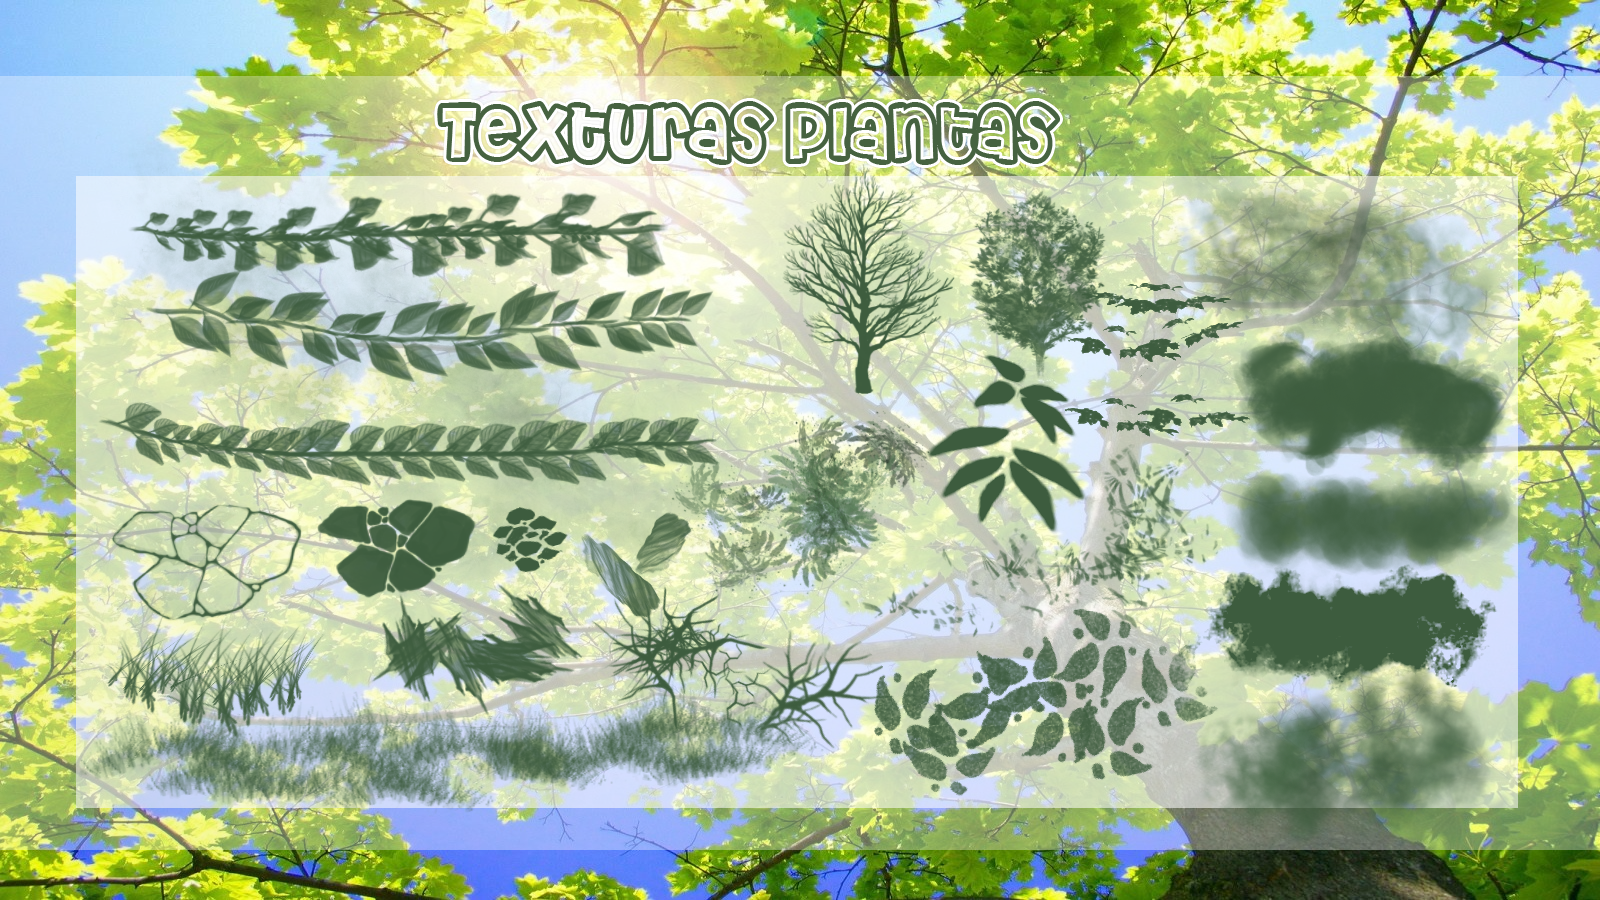 Texturas Plantas by Recursos-SAI on DeviantArt